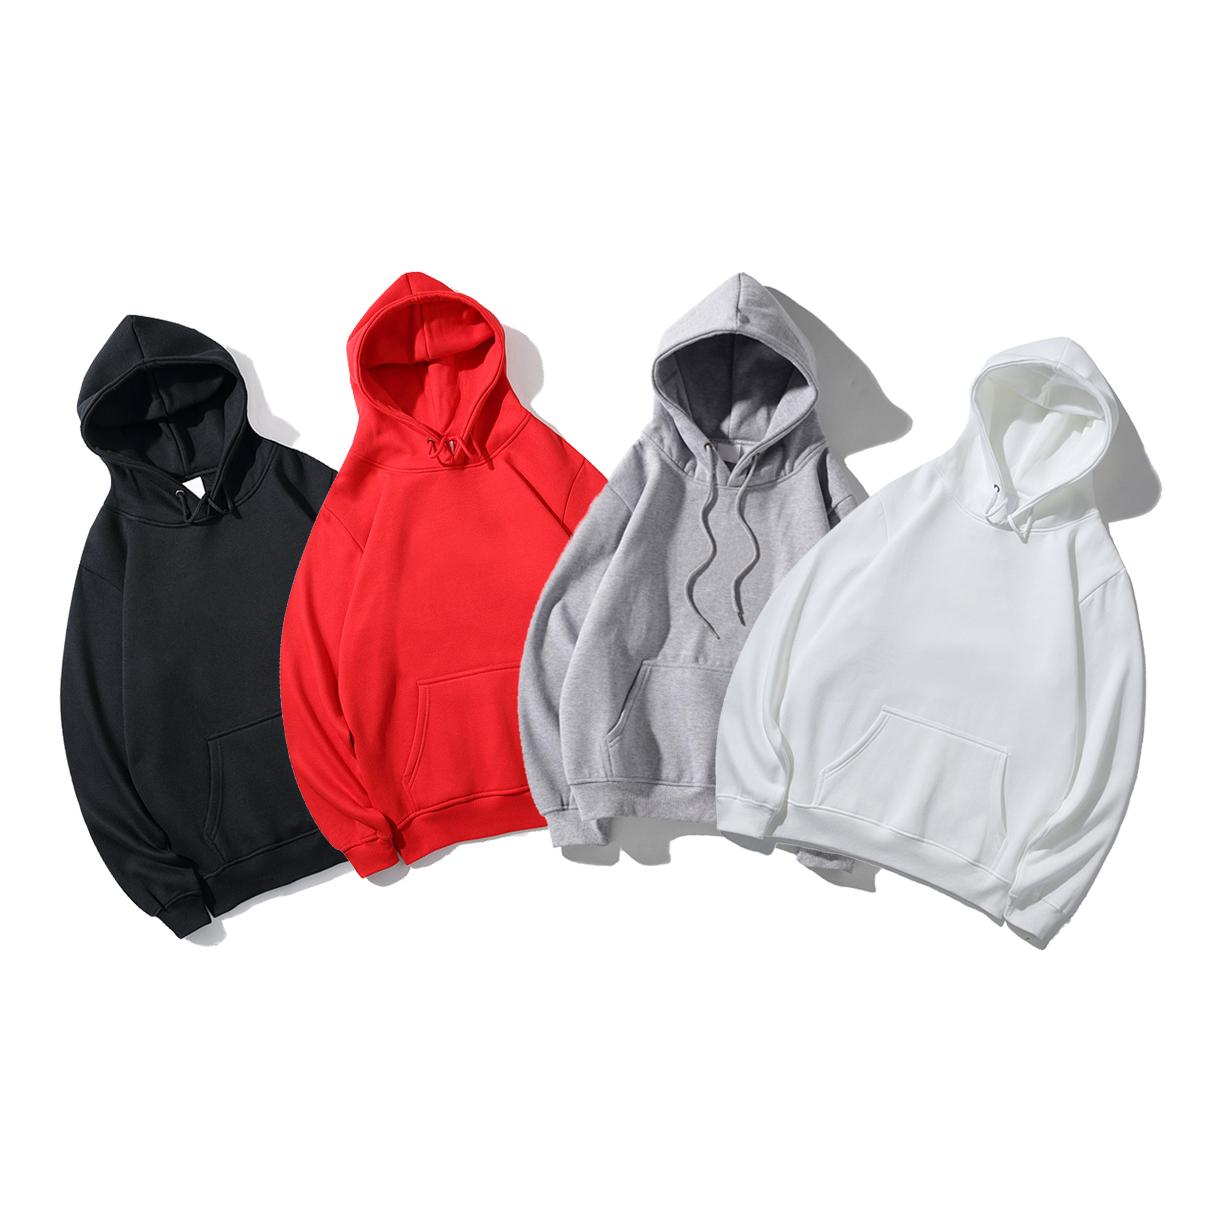 Men Hoodies Fashion Sweatshirts Letter Embroidery Pullover Men Women Hip Hop Sweatshirts Hot Sale Loose Hoodies 5 Styles Casual Clothing